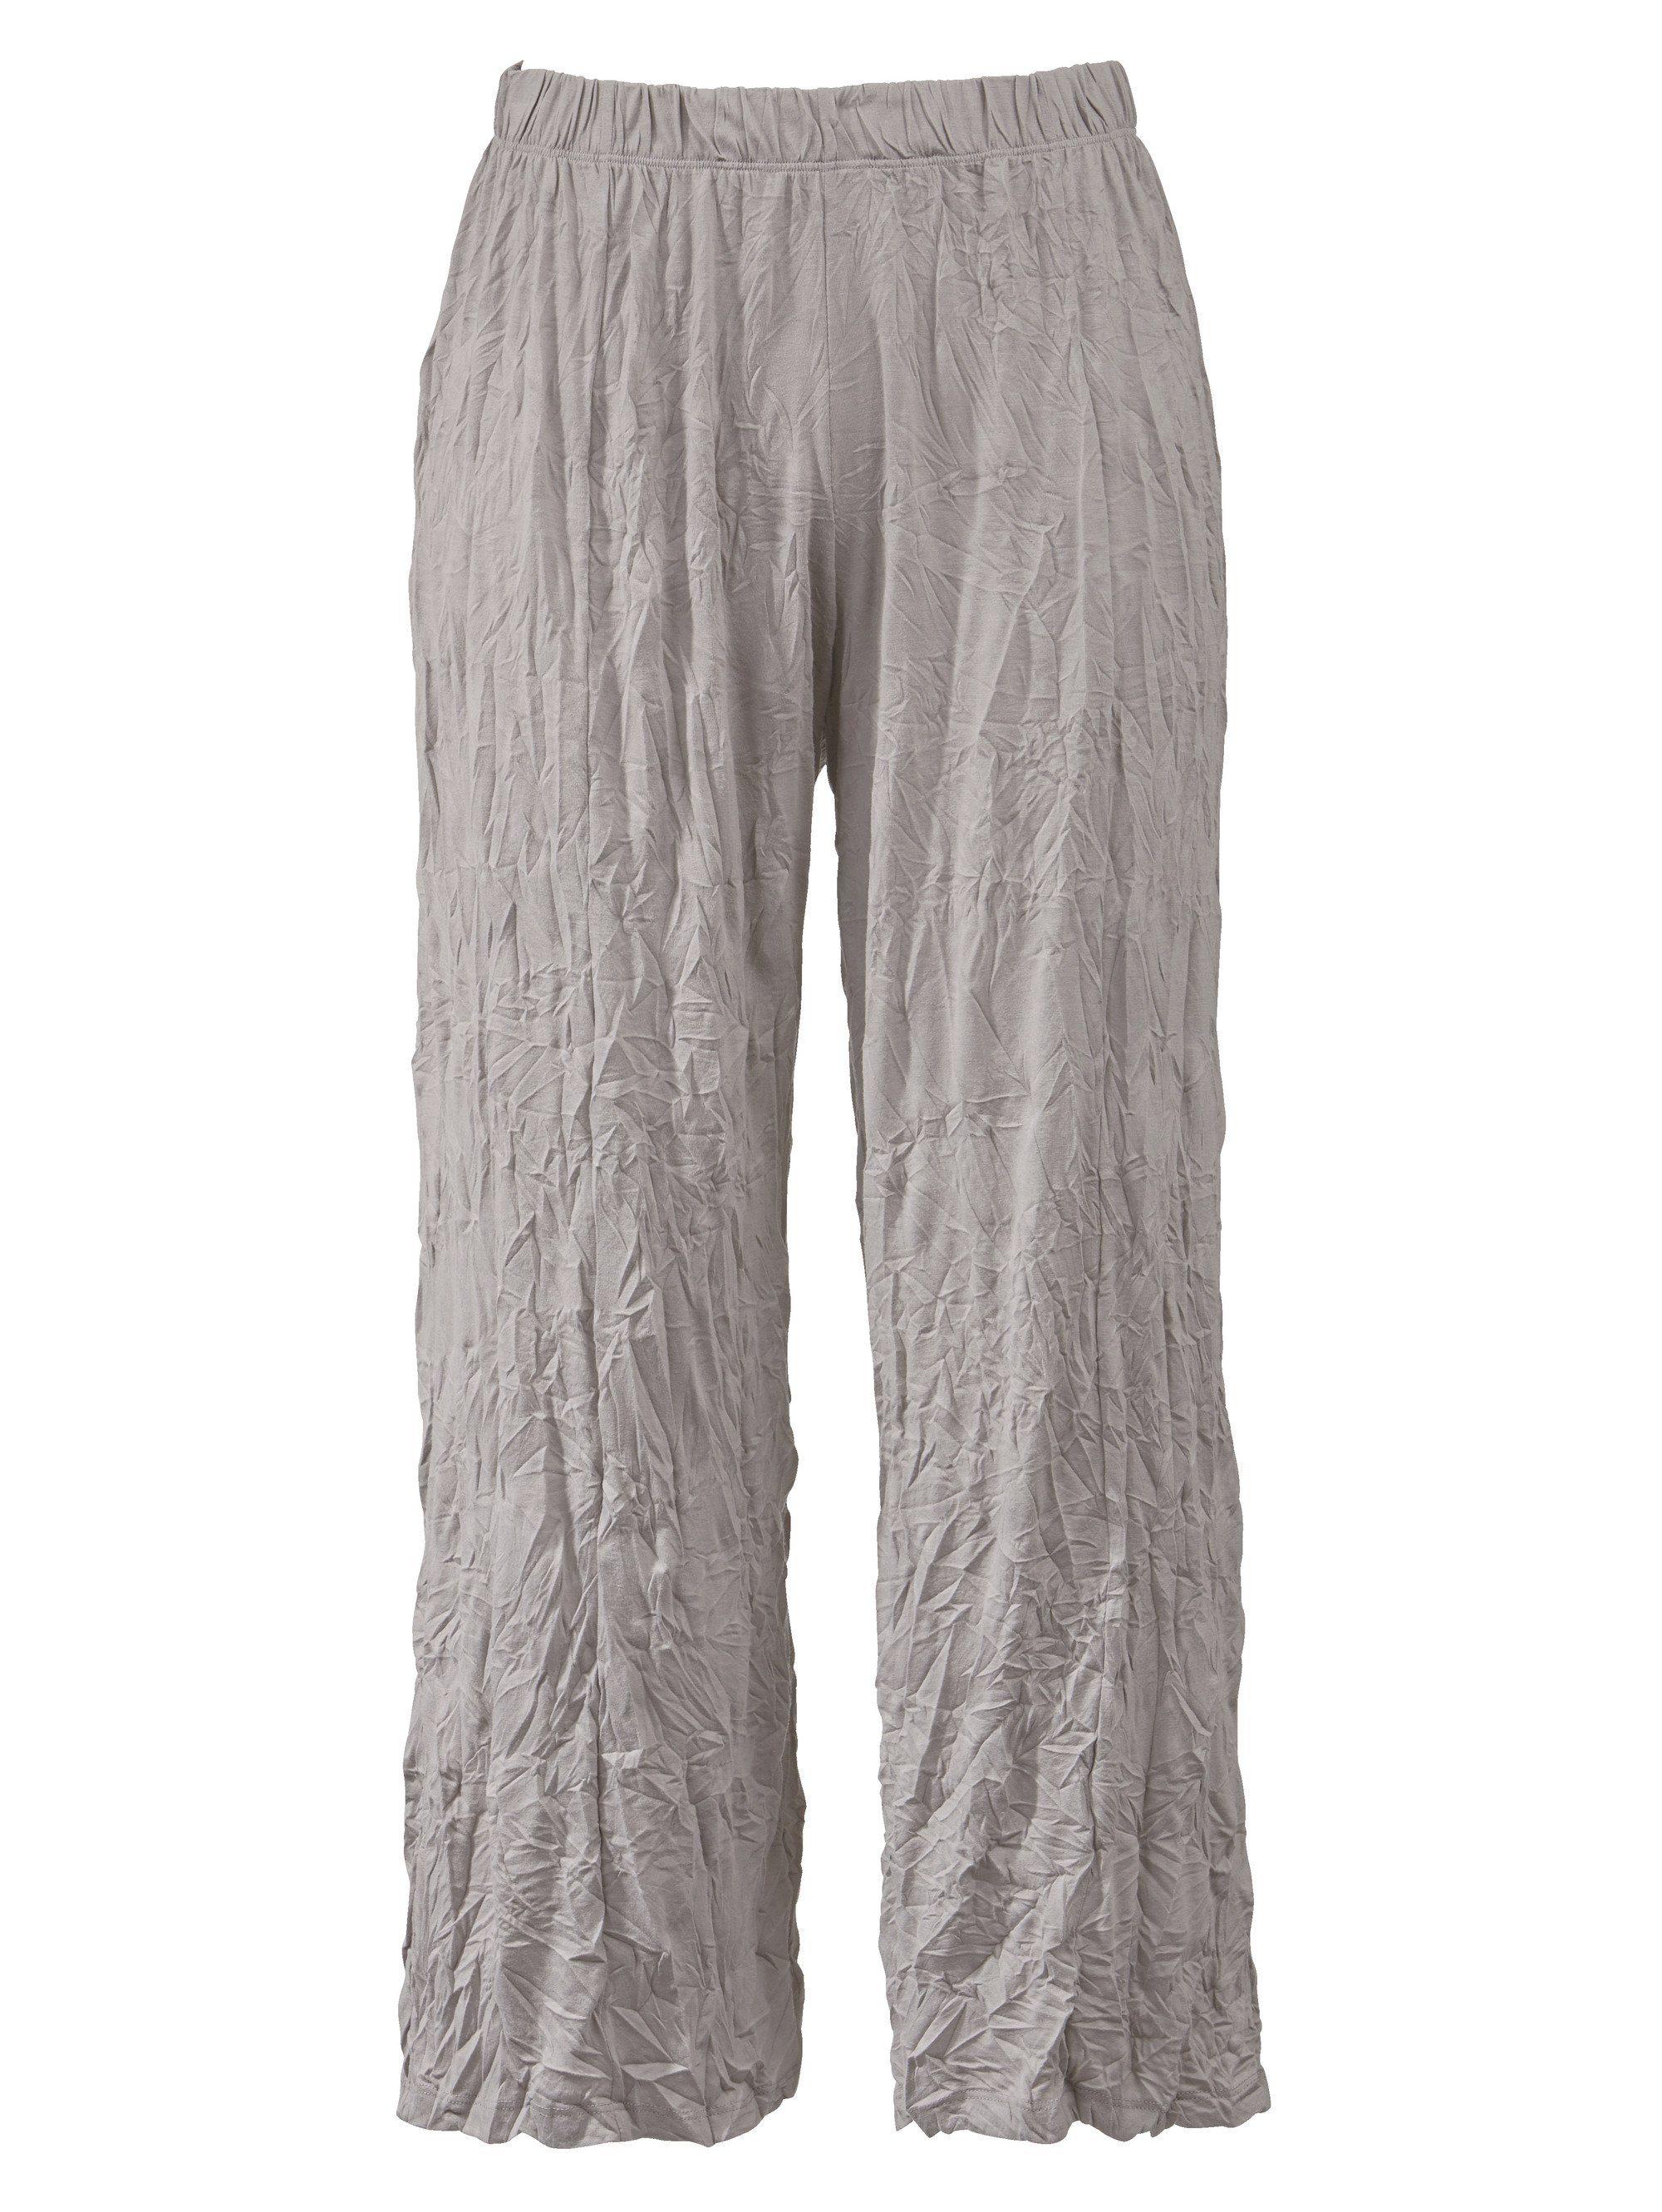 One Size Outwell Erwachsene Windschutz Touring Grey